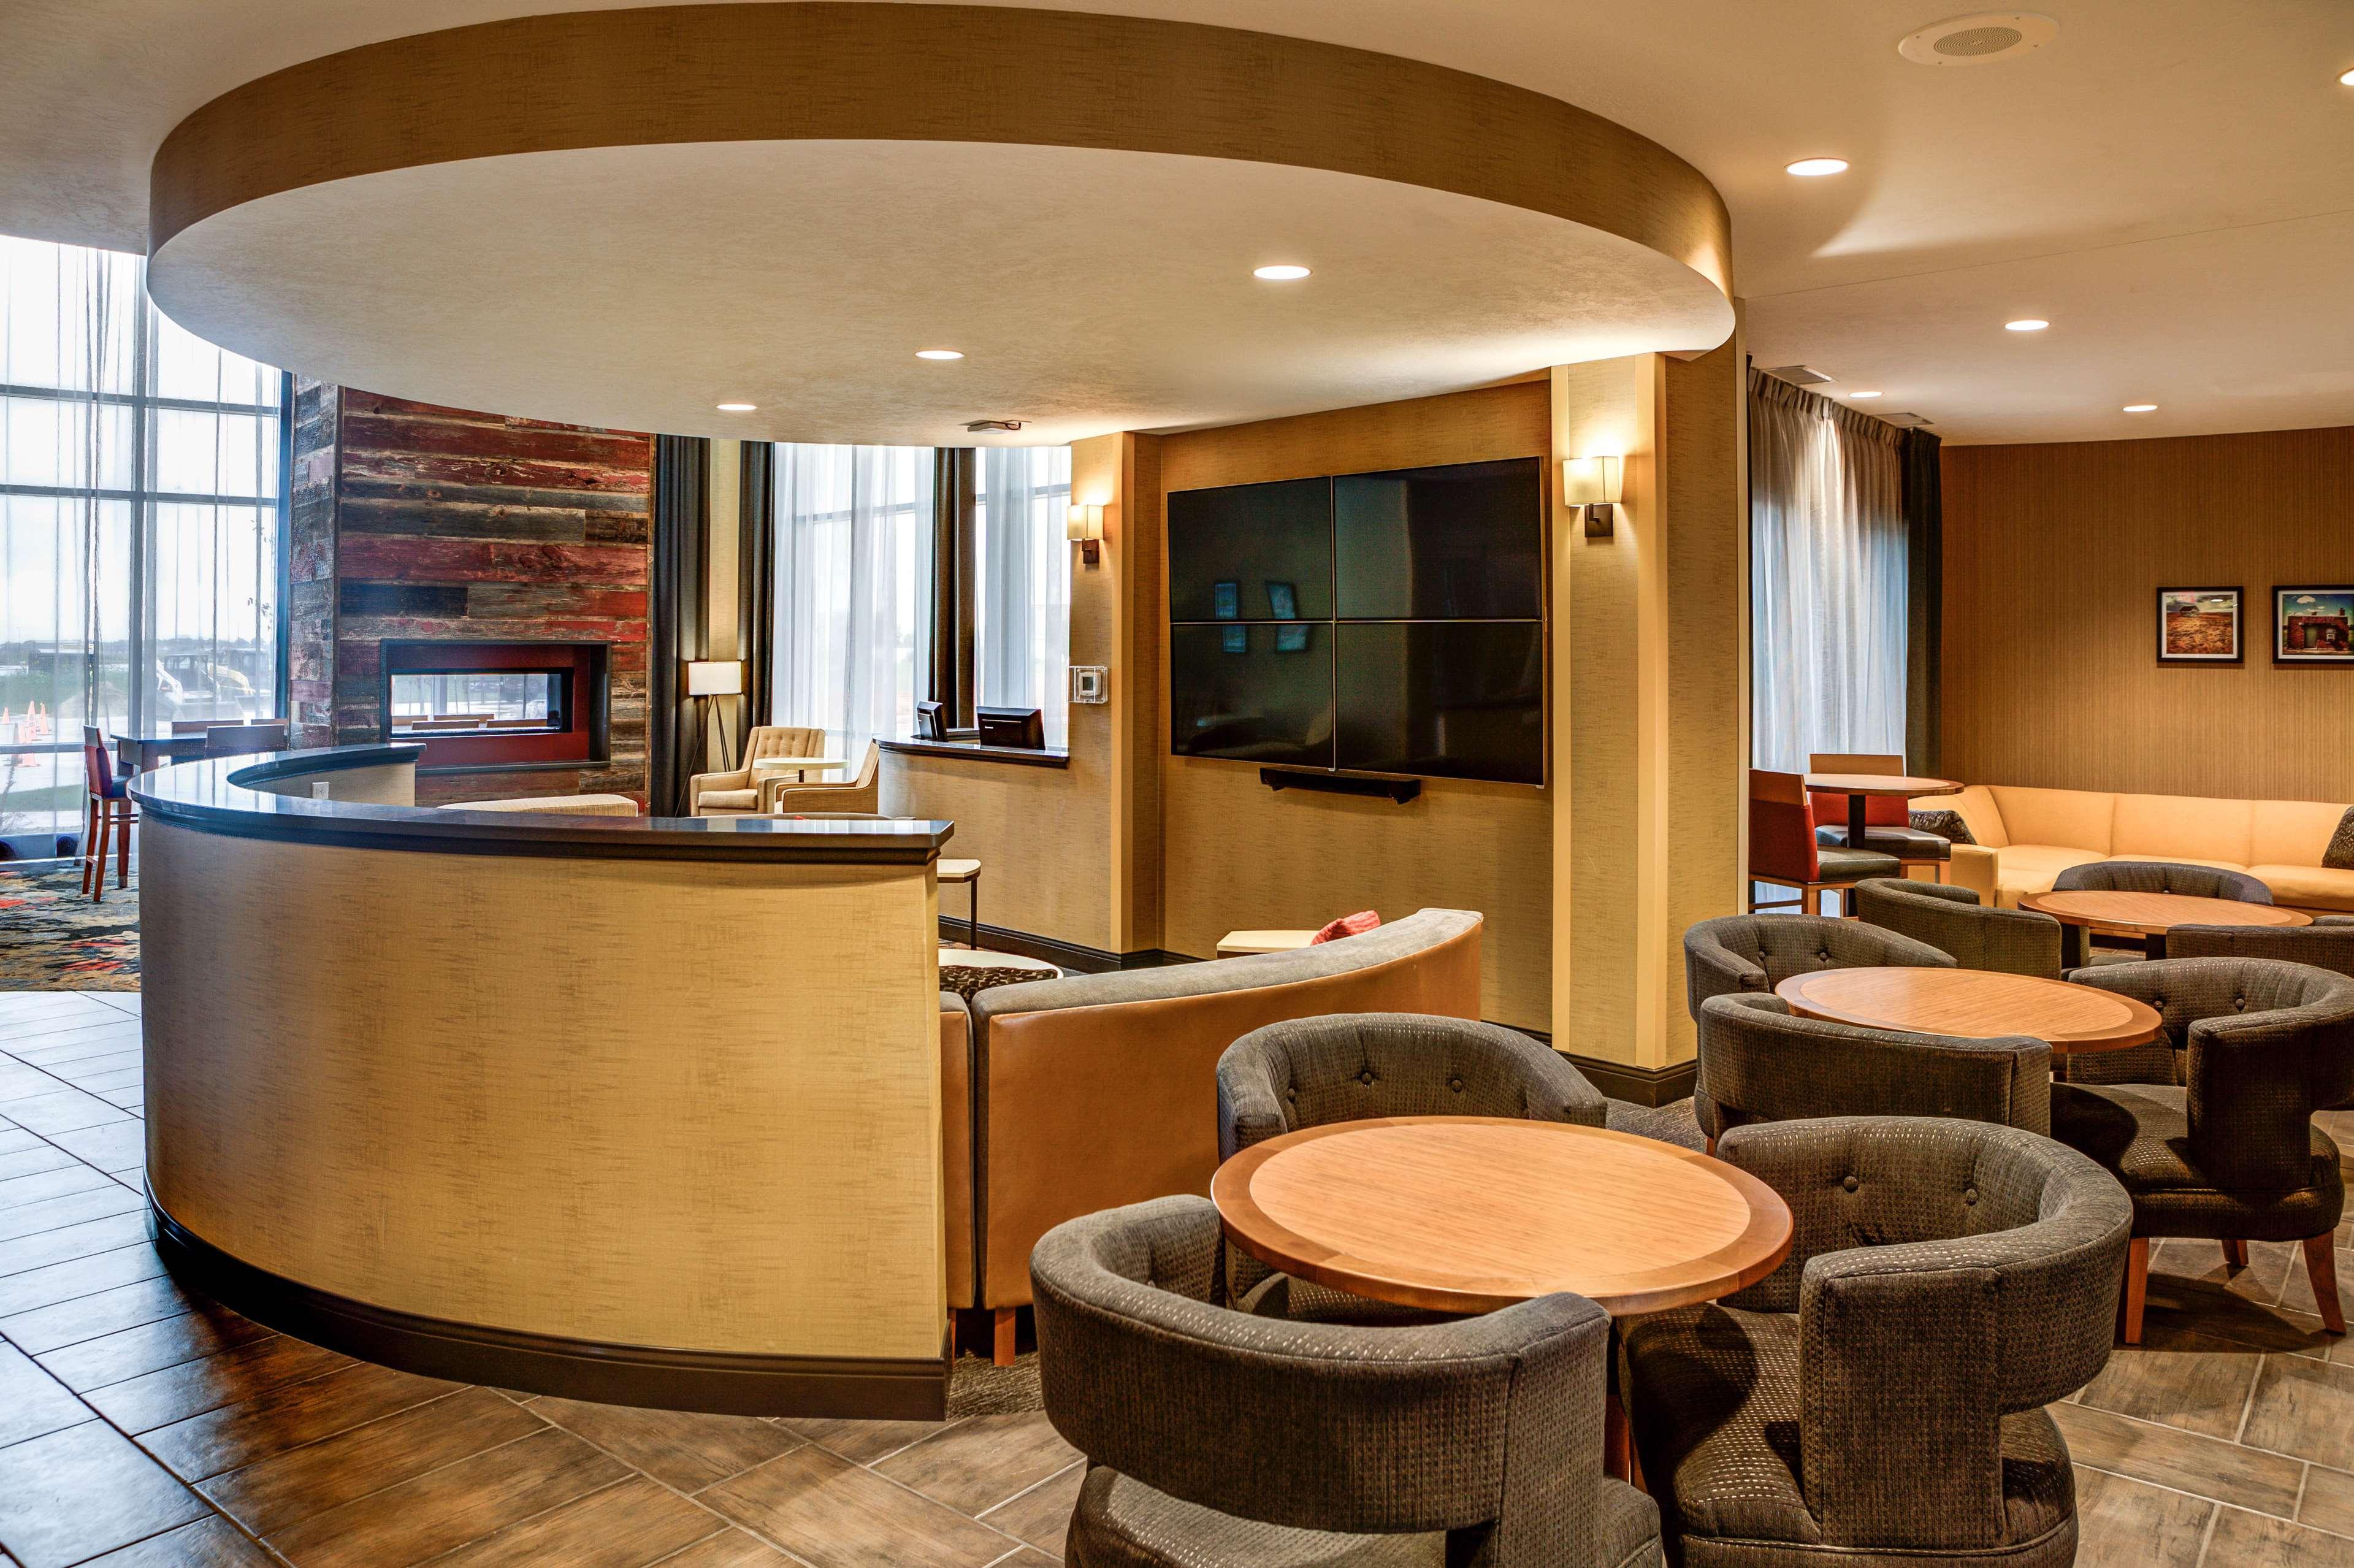 DoubleTree by Hilton West Fargo image 7